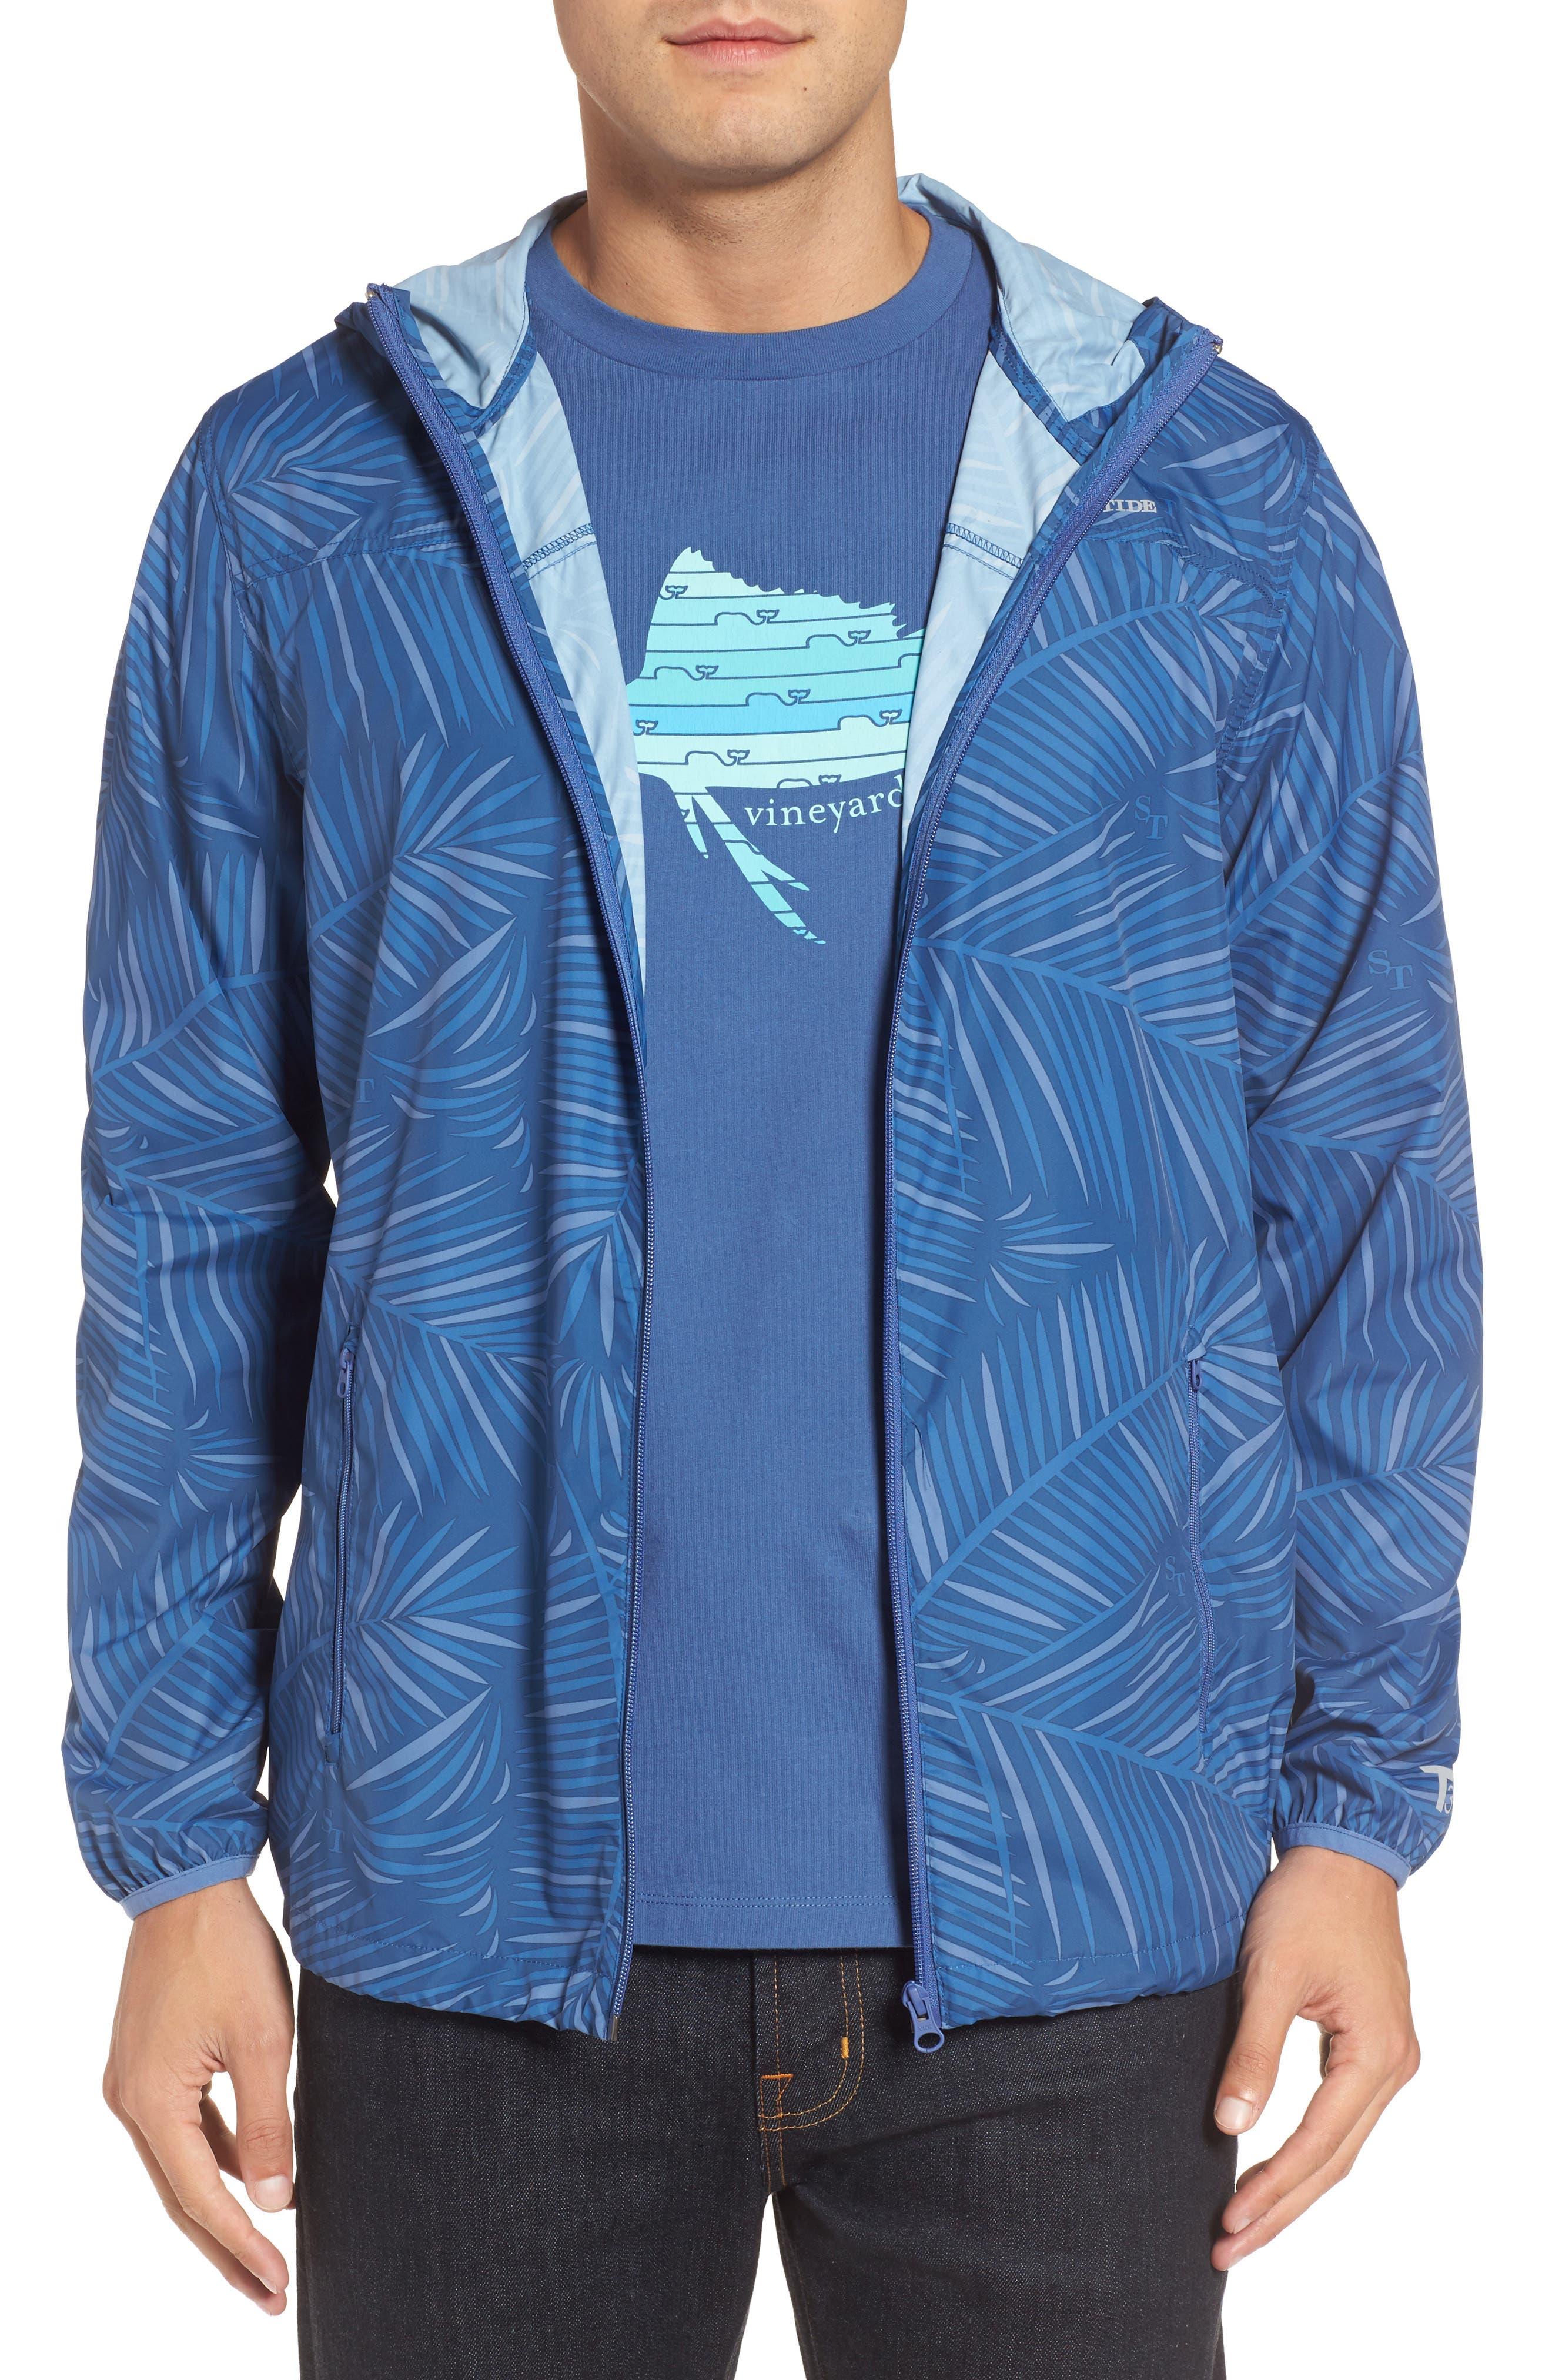 Pelican Peak Full Zip Hooded Jacket,                             Main thumbnail 1, color,                             425